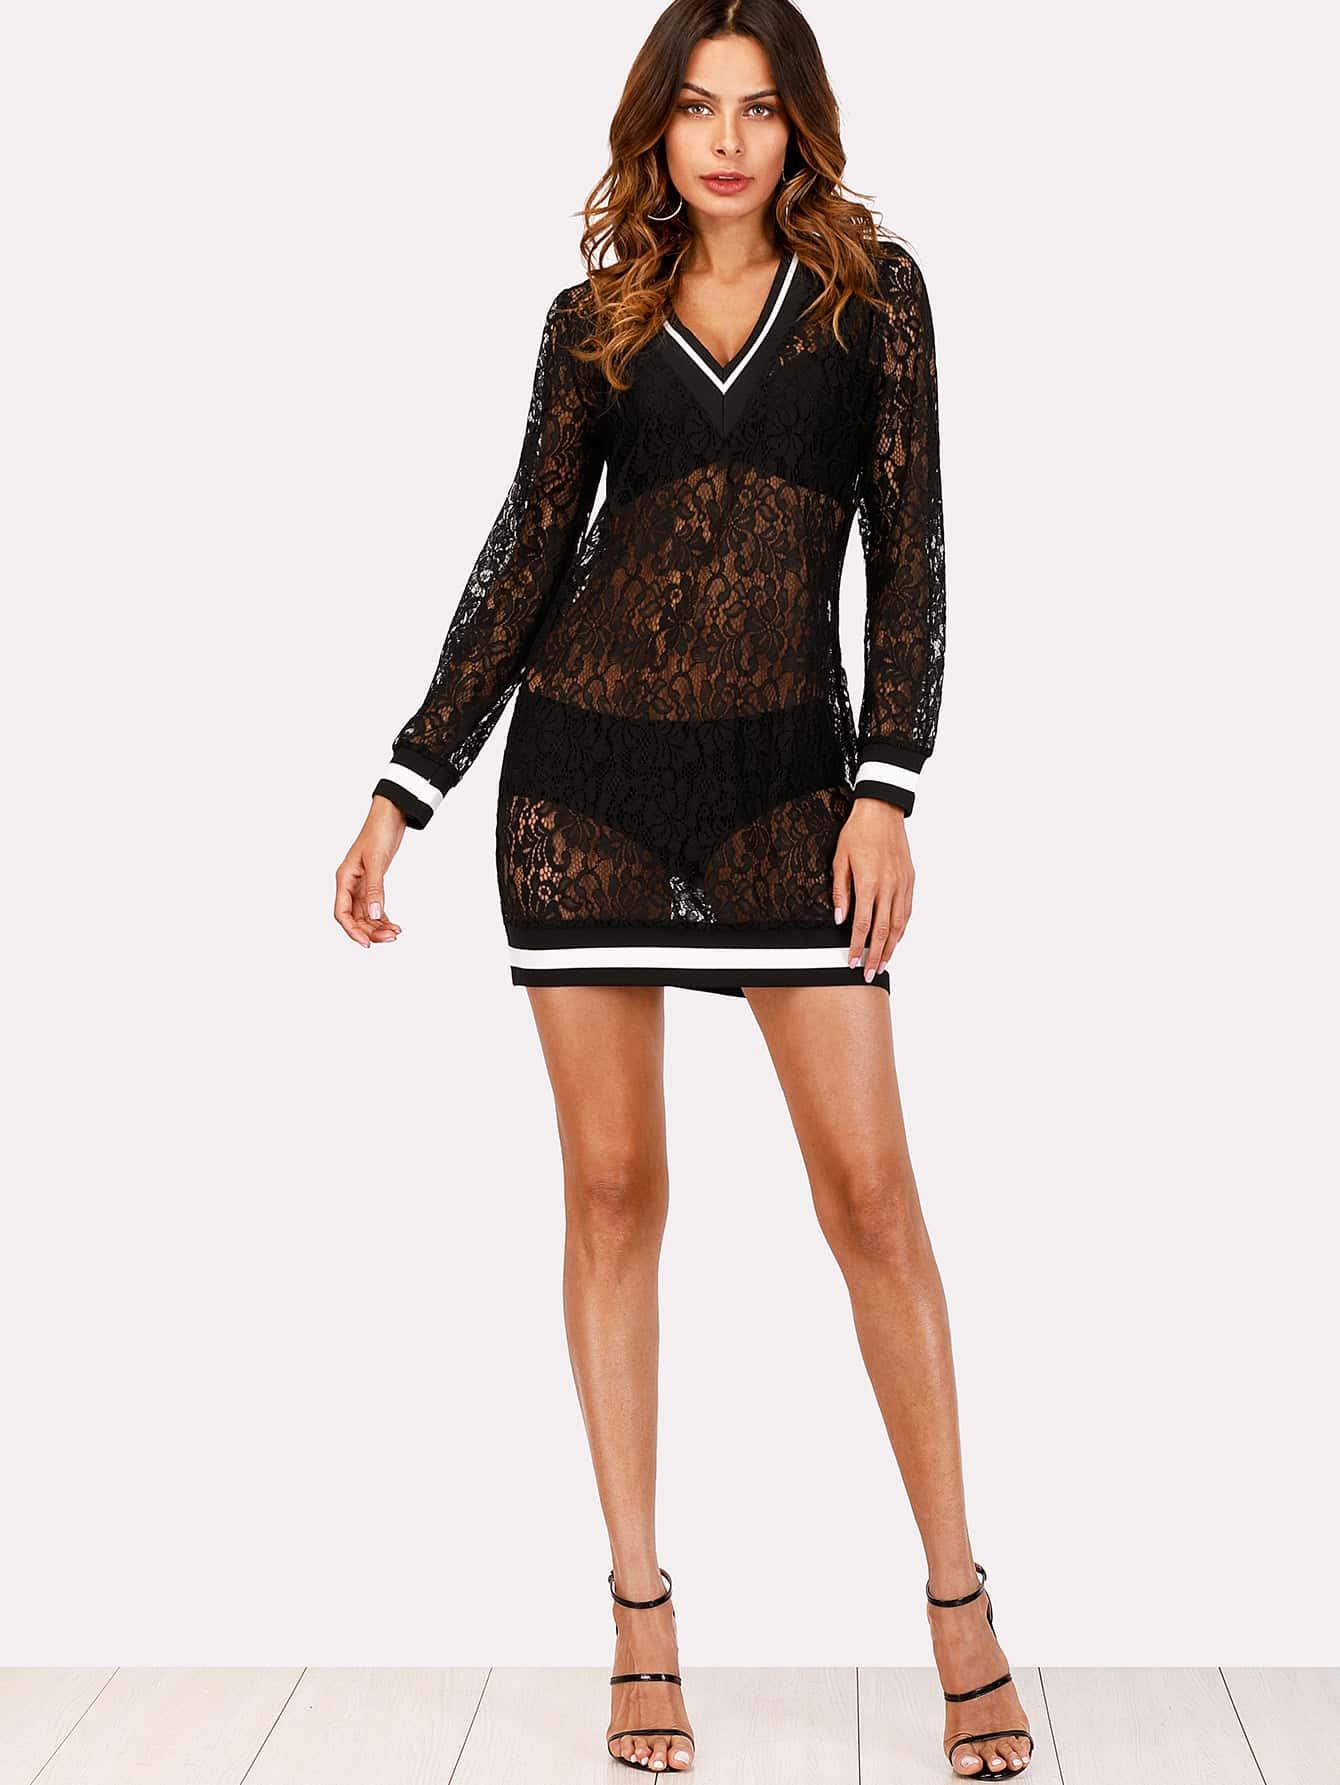 Contrast Striped Trim Lace Dress maison jules new junior s small s pink combo lace crepe contrast trim dress $89